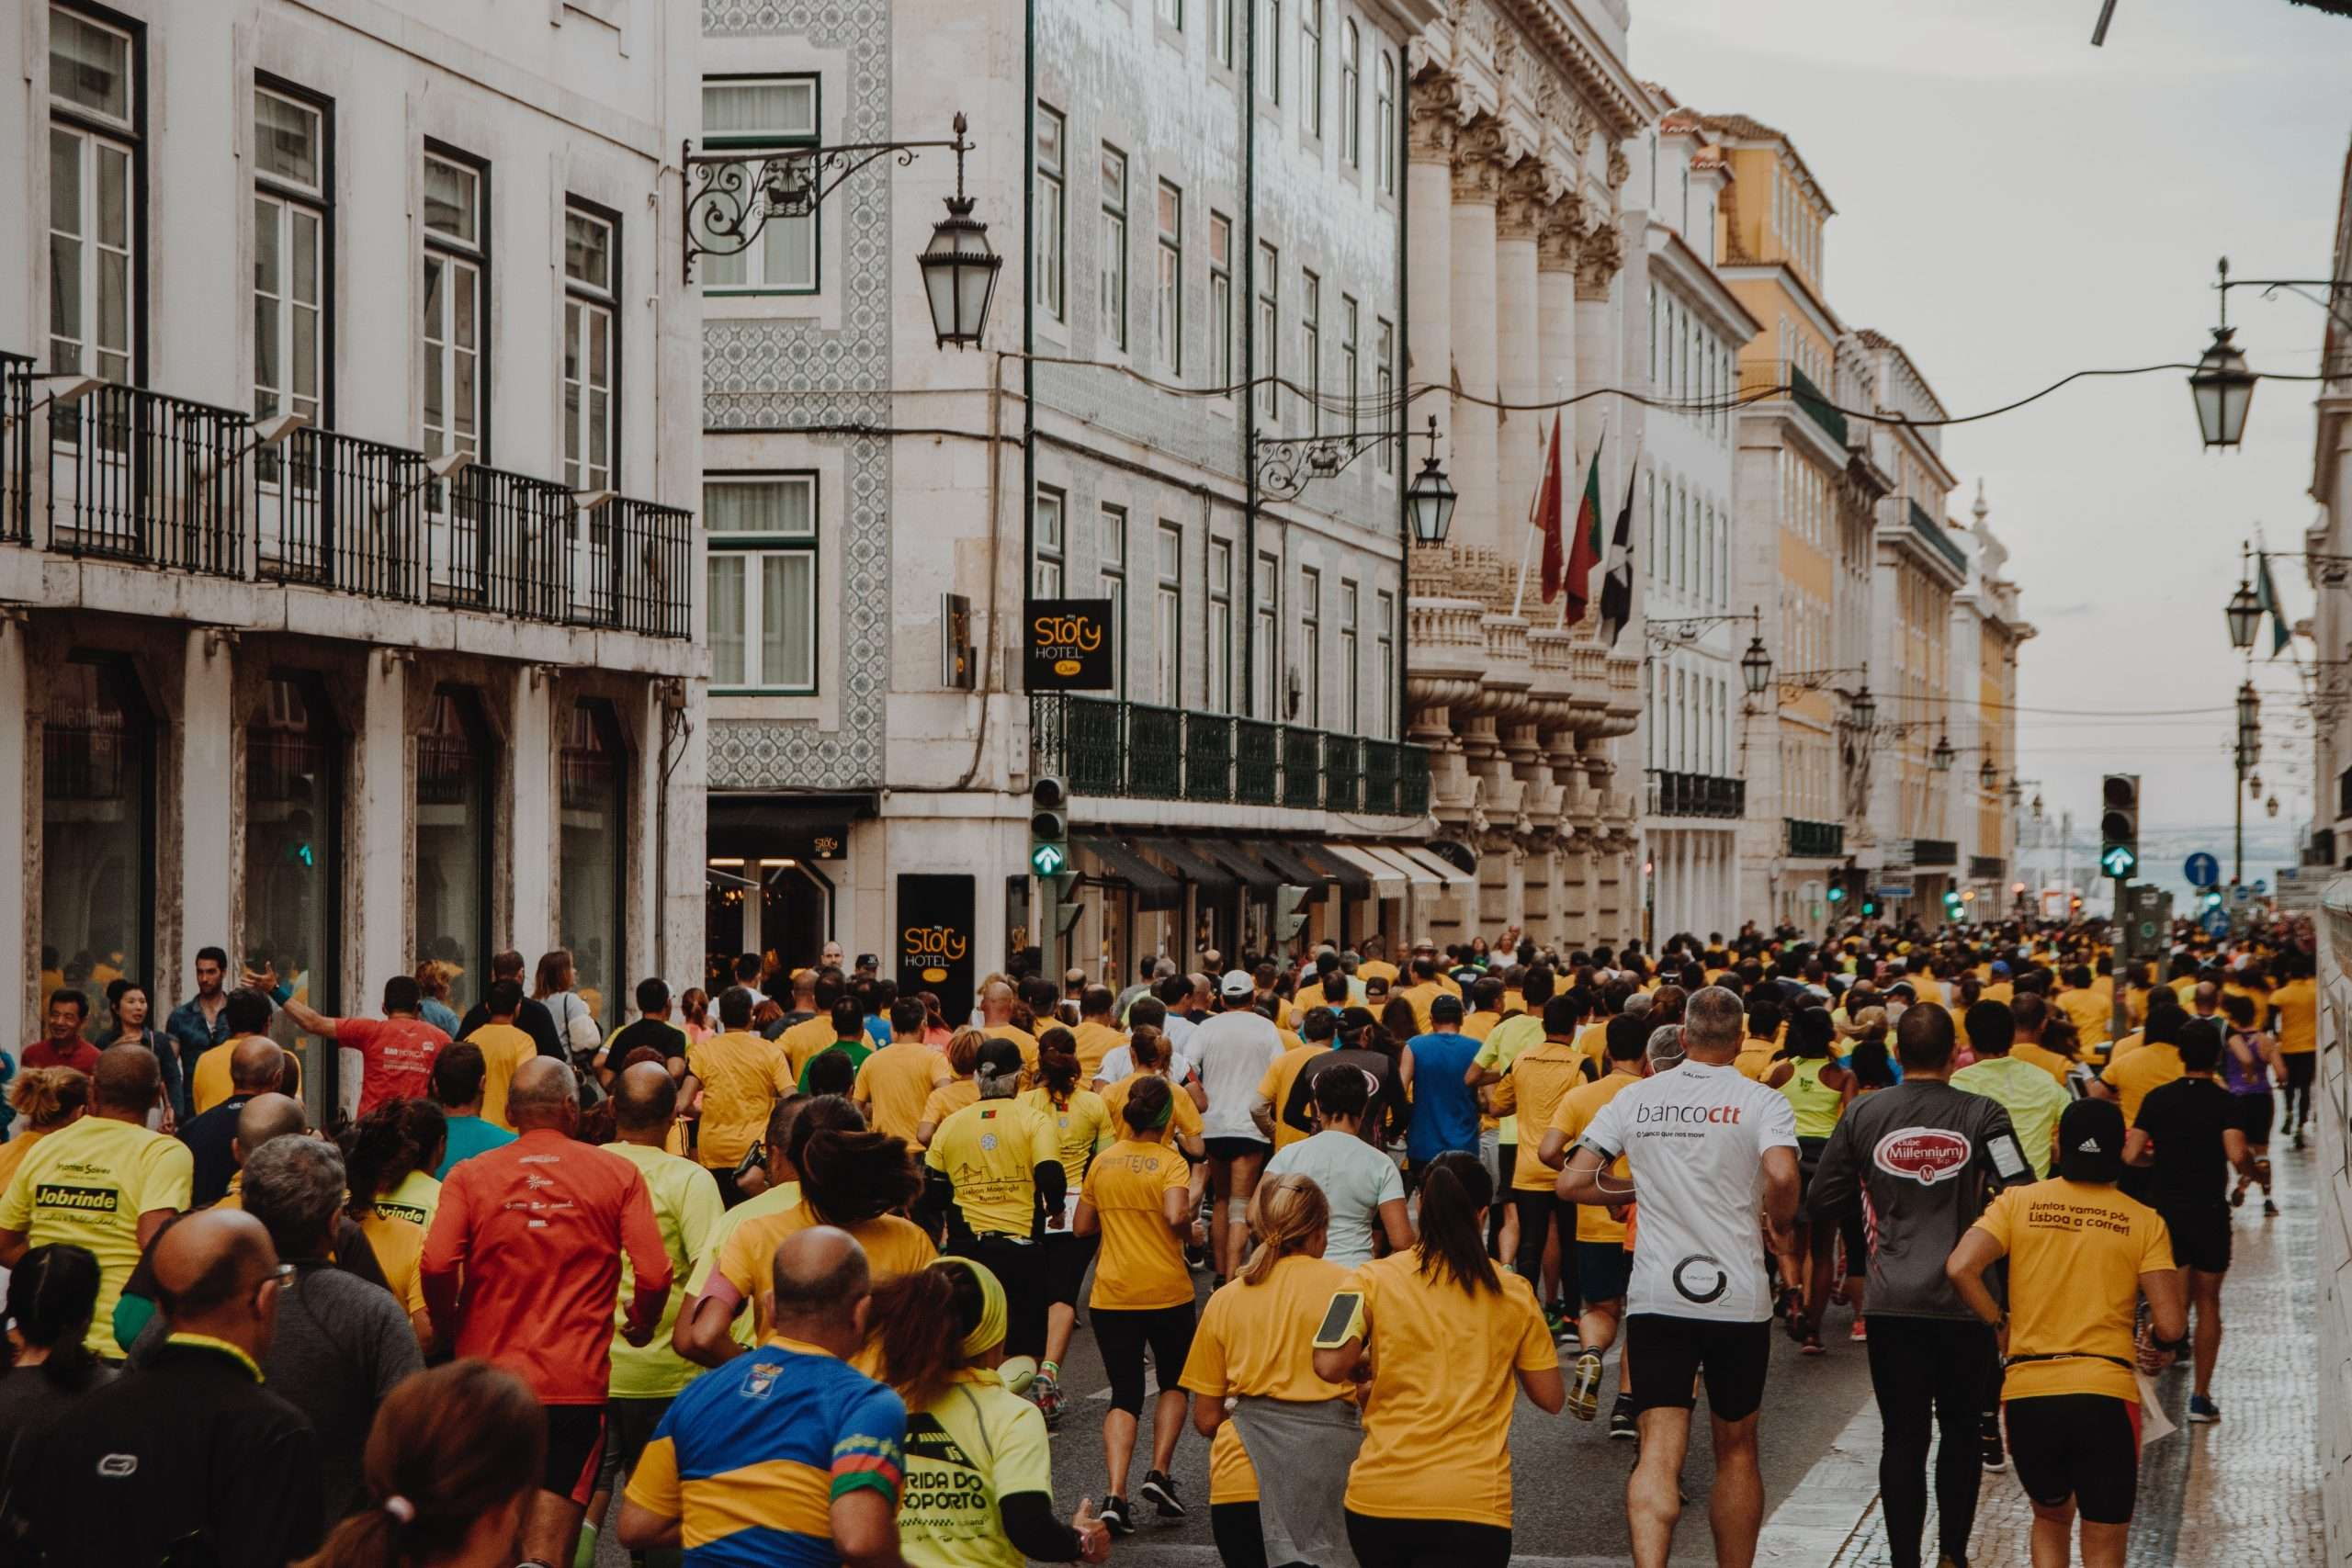 Marathon runners in a street